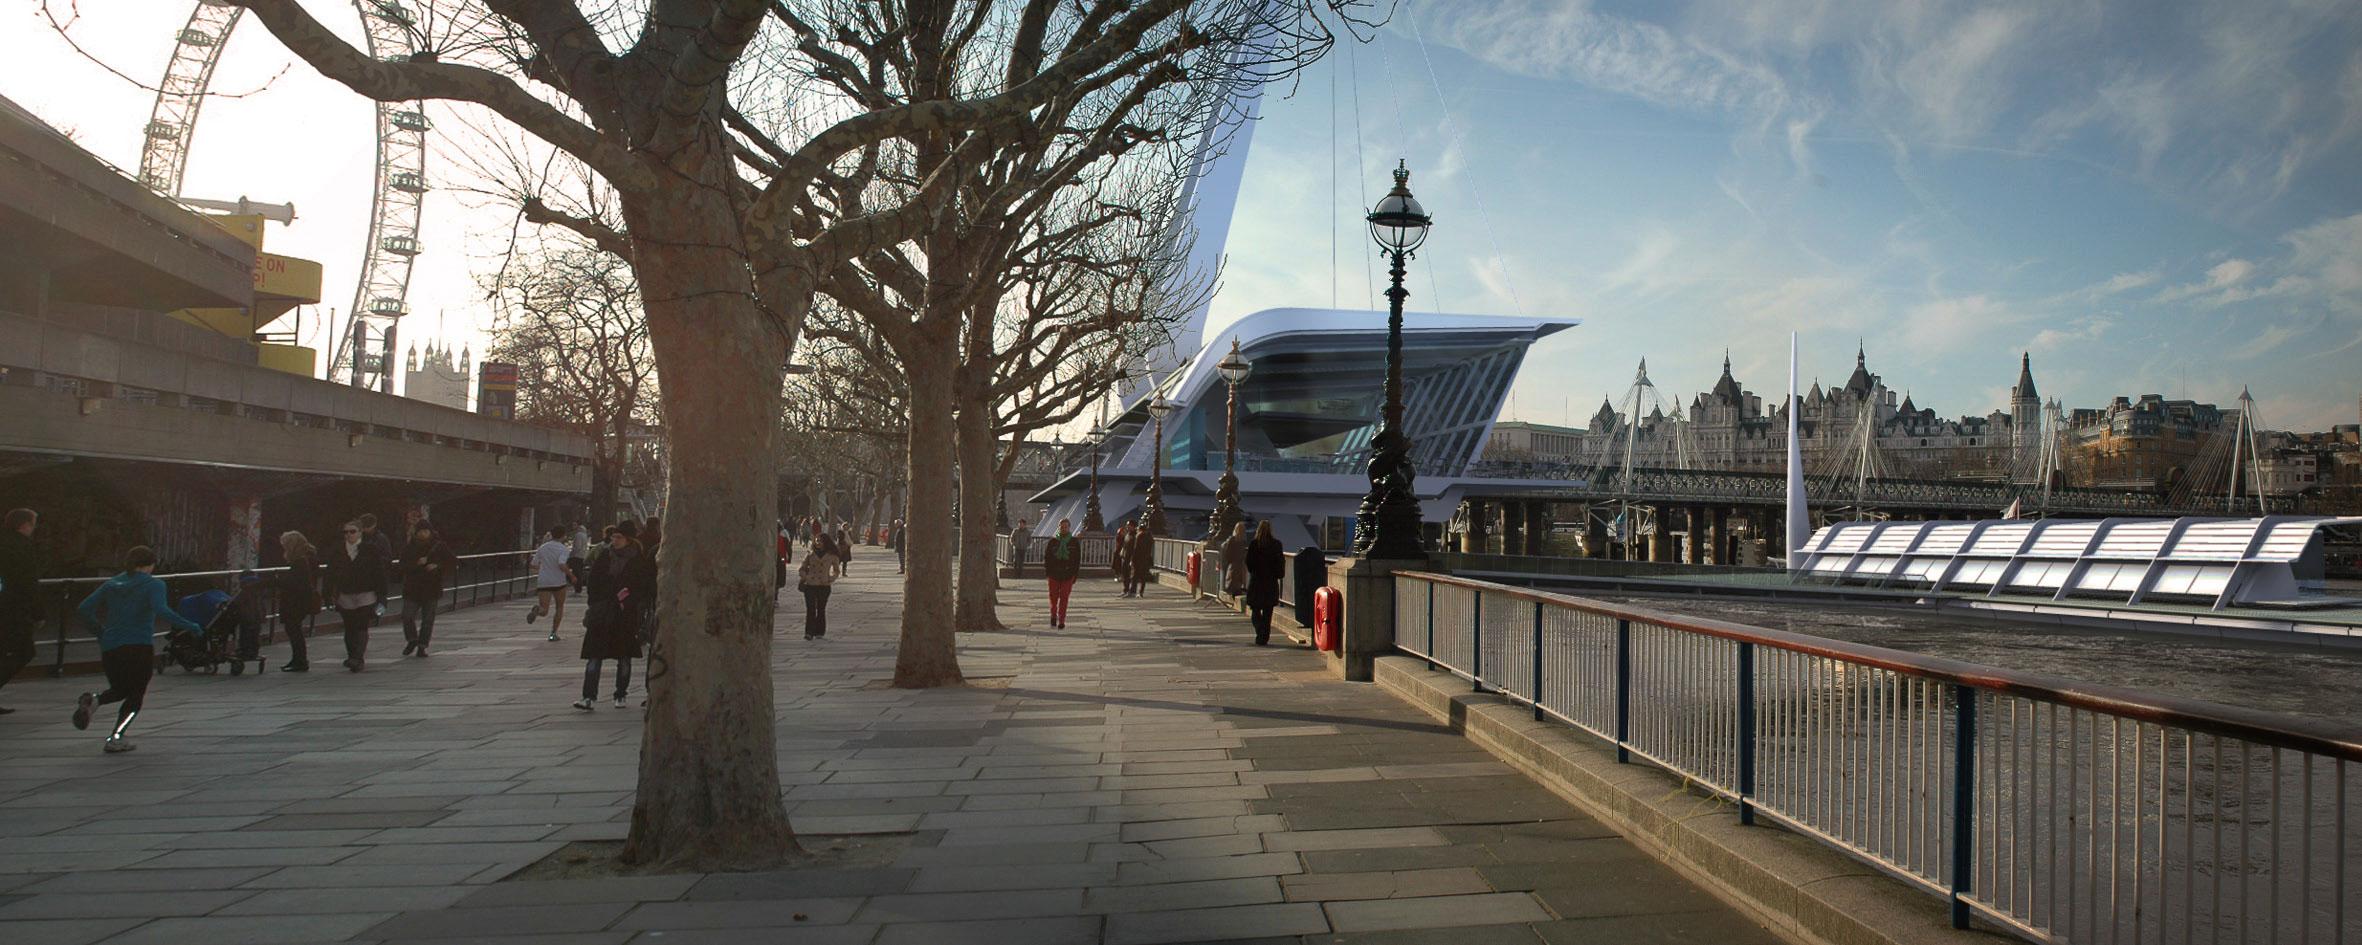 Southbank, Festival Pier, River Thames, Thames Clipper, Modern Architecture